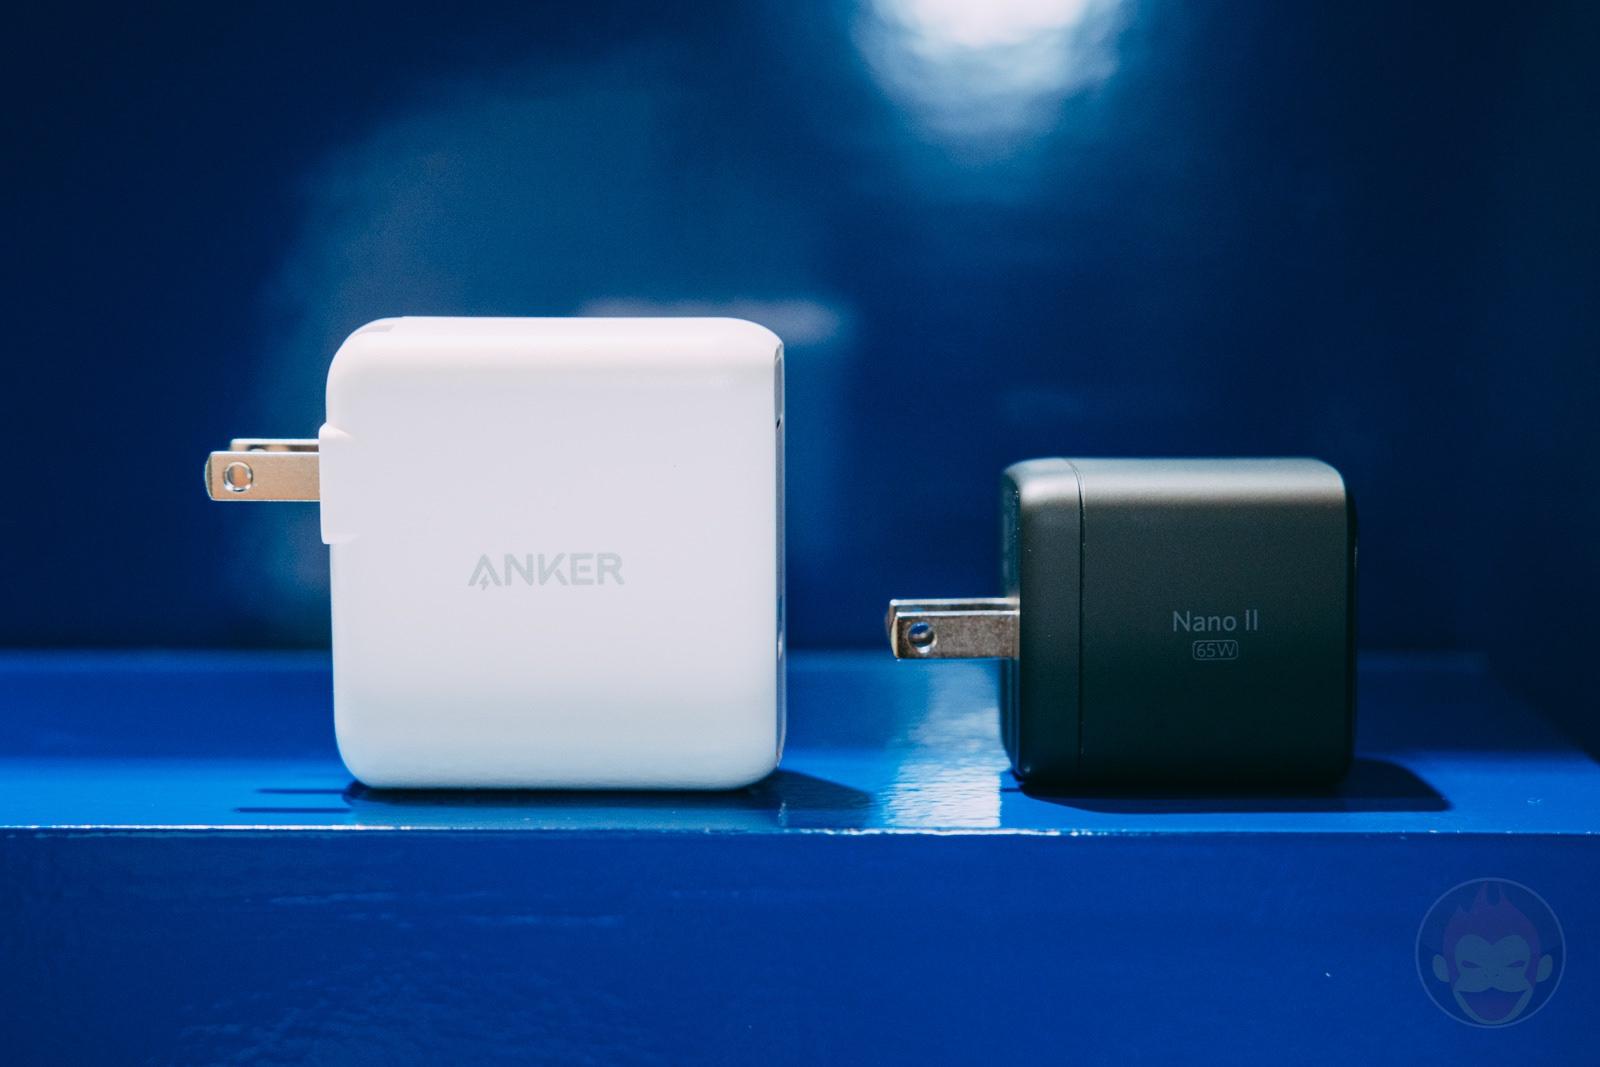 Anker GAN II Nano Series Hands On 16